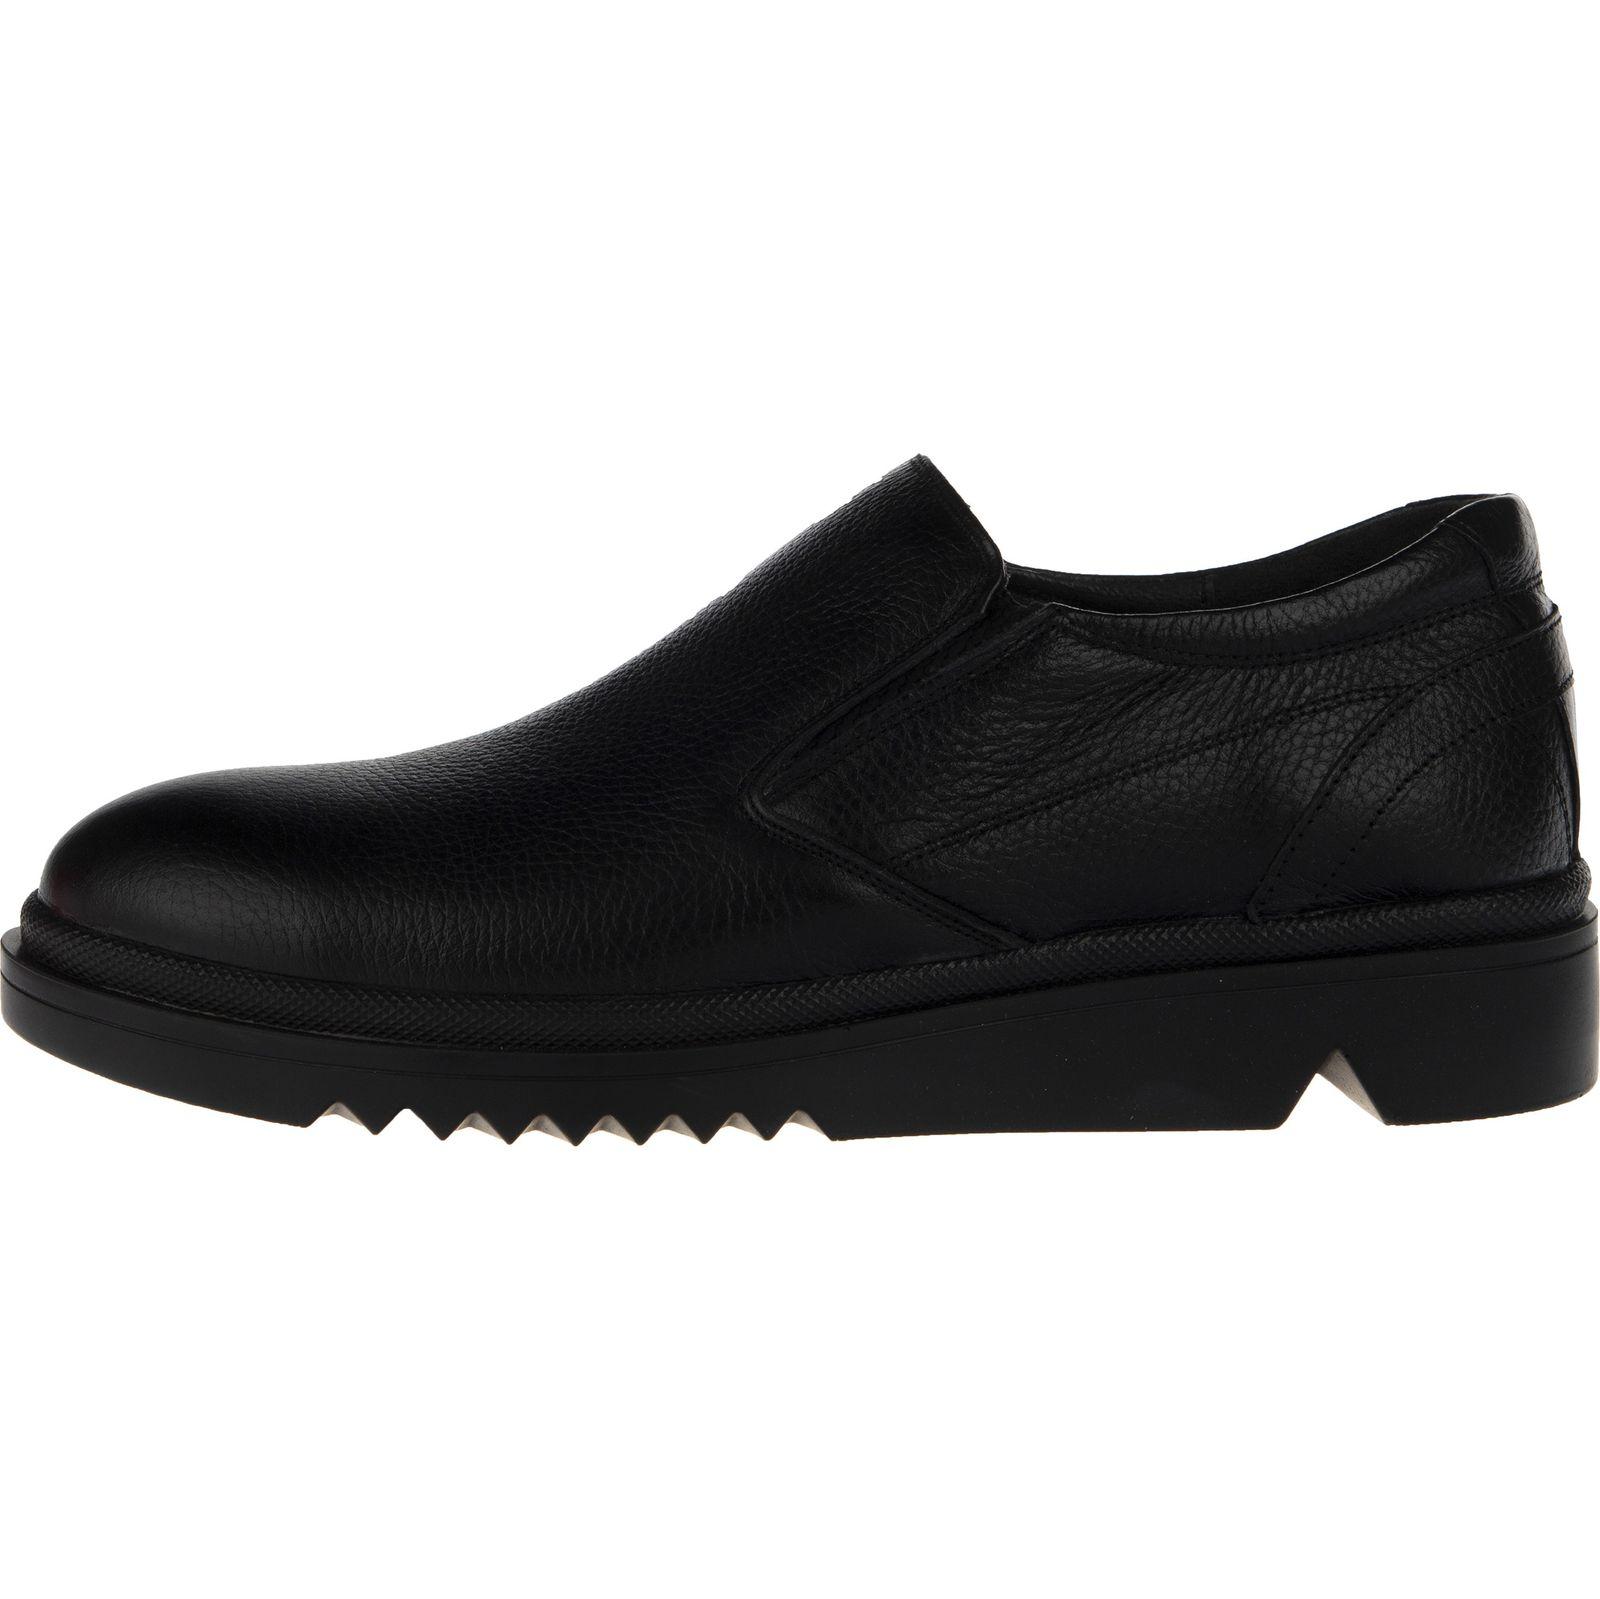 کفش روزمره مردانه شیفر مدل 7160A-101 -  - 2